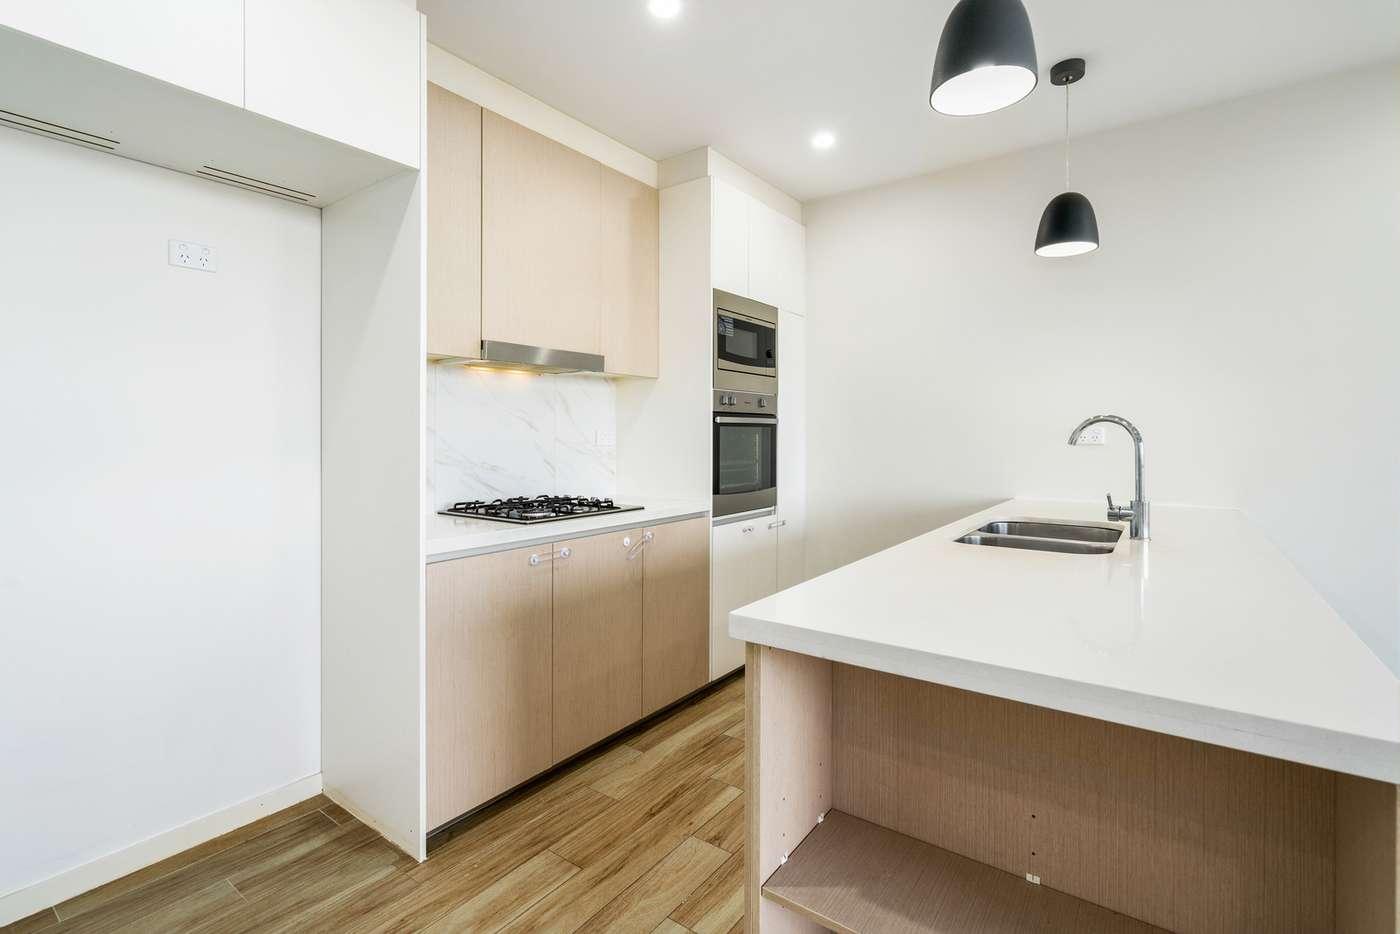 Main view of Homely apartment listing, A801/35 Rawson Street, Auburn NSW 2144